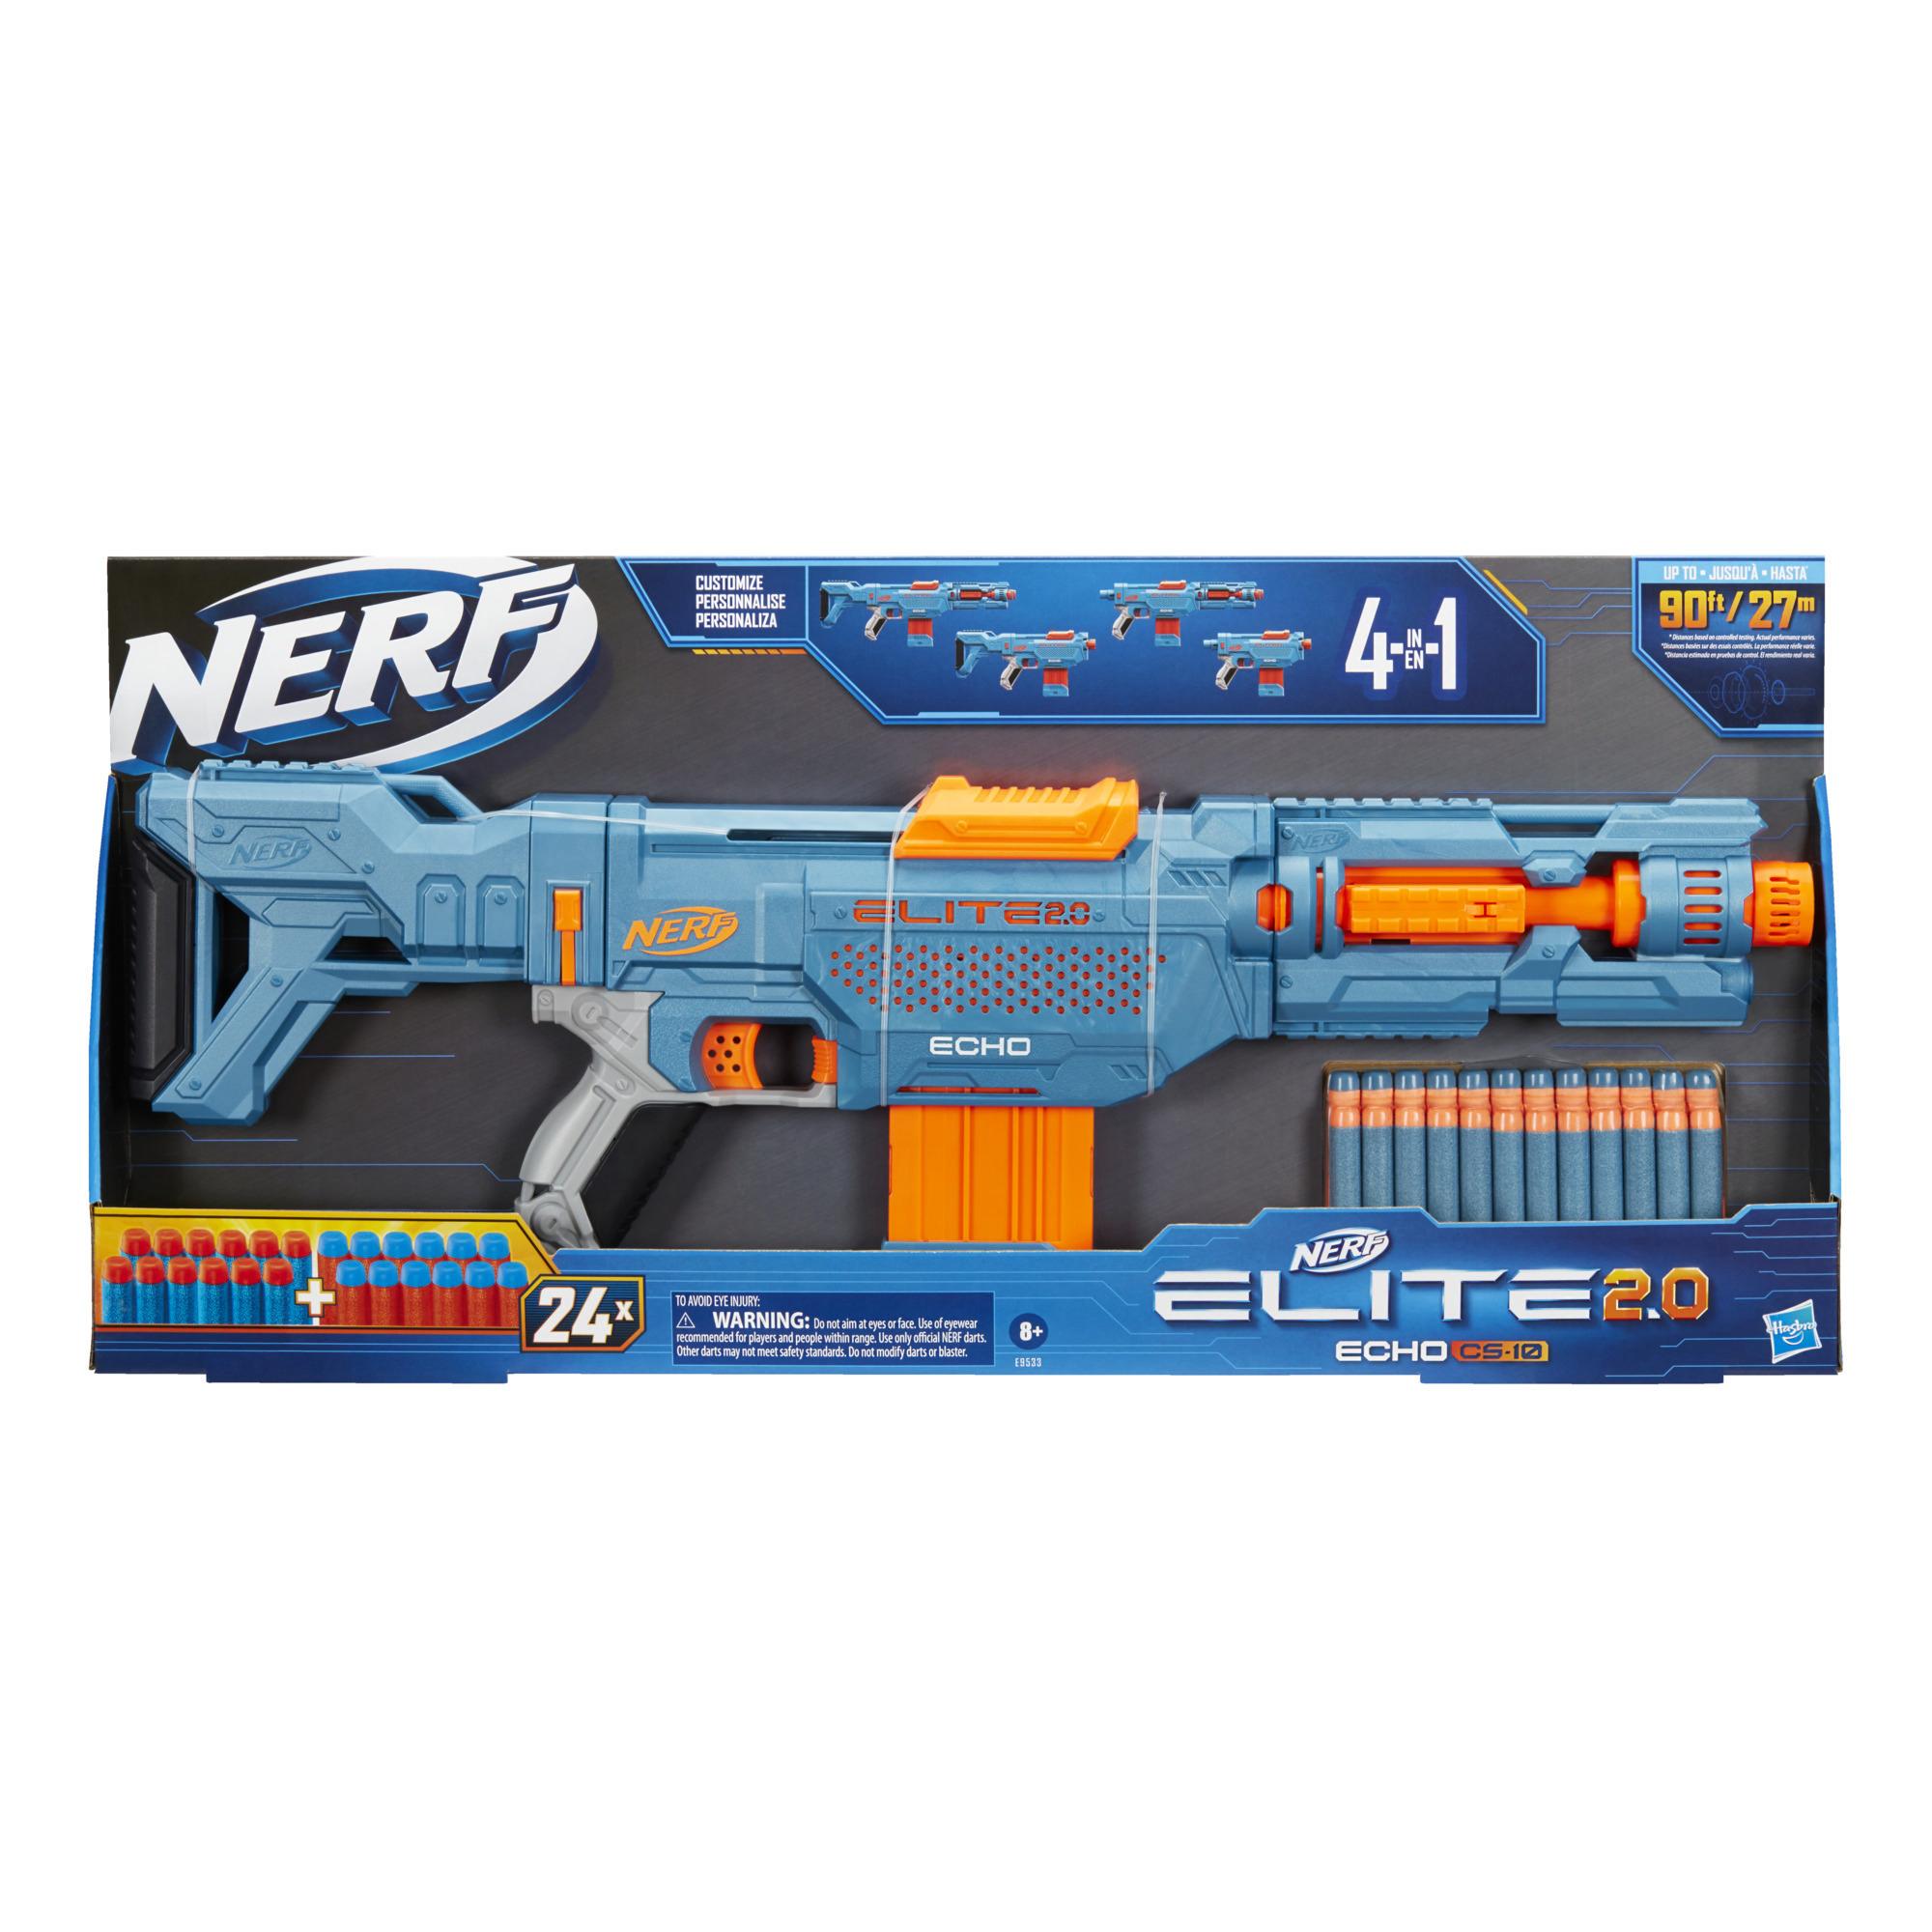 Blaster Nerf Elite 2.0 Echo CS-10, 24 de sageti Nerf, incarcator pentru 10 sageti, pat demontabil si extensie pentru teava, 4 sine tactice